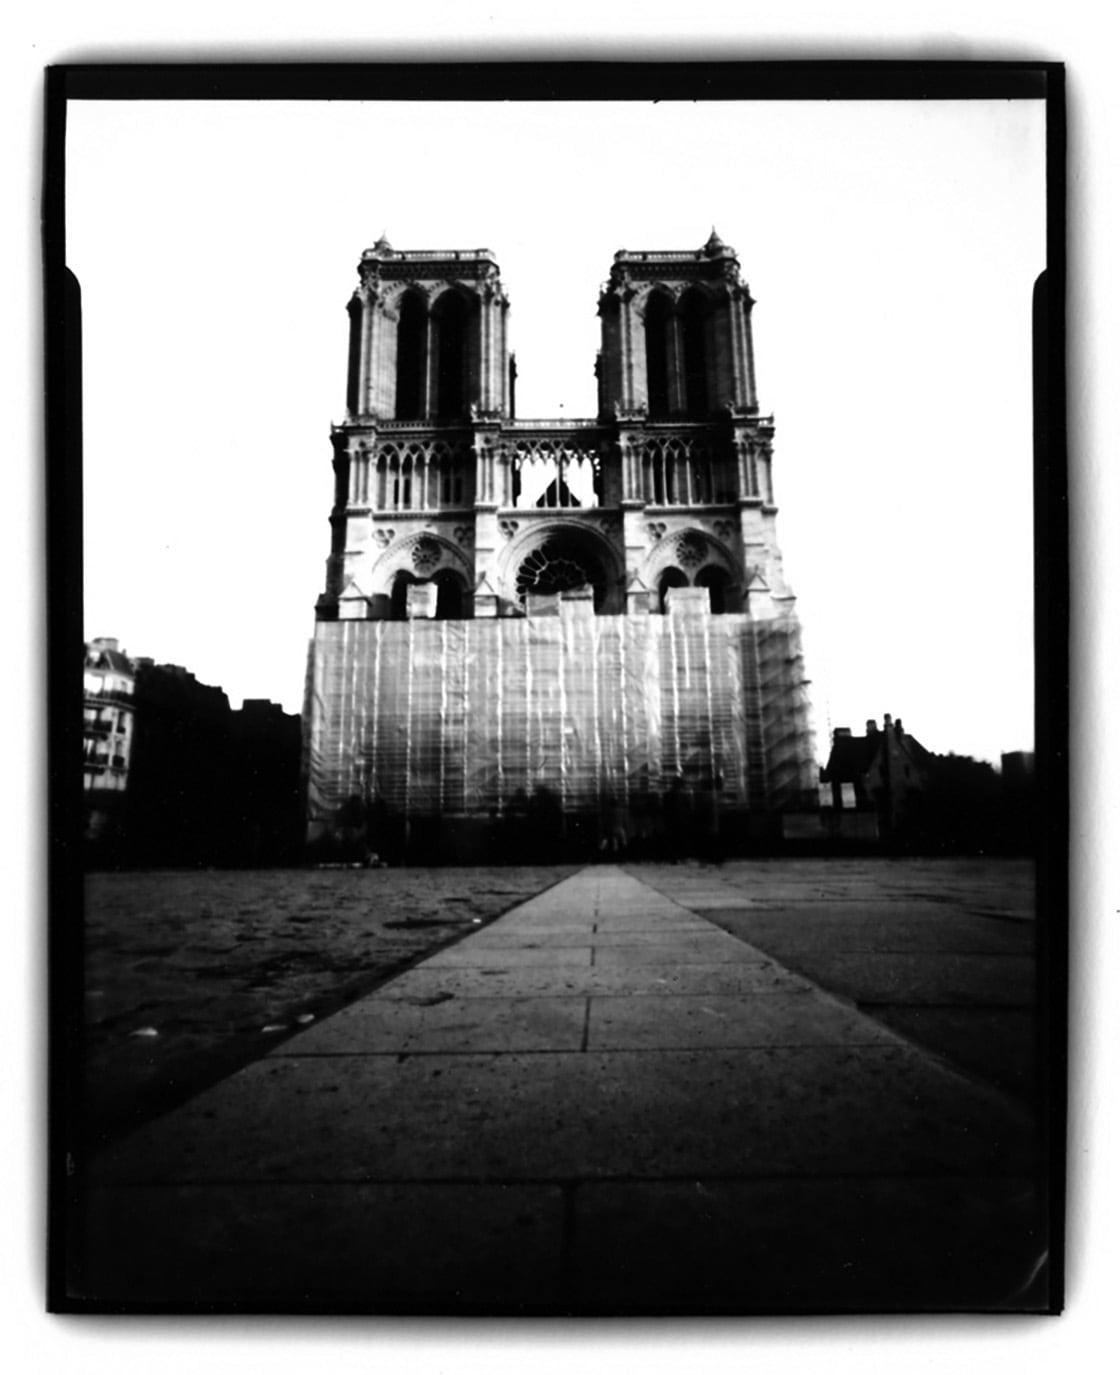 Notre Dame, Paris, 1998 - Dianne Bos at Kostuik Gallery